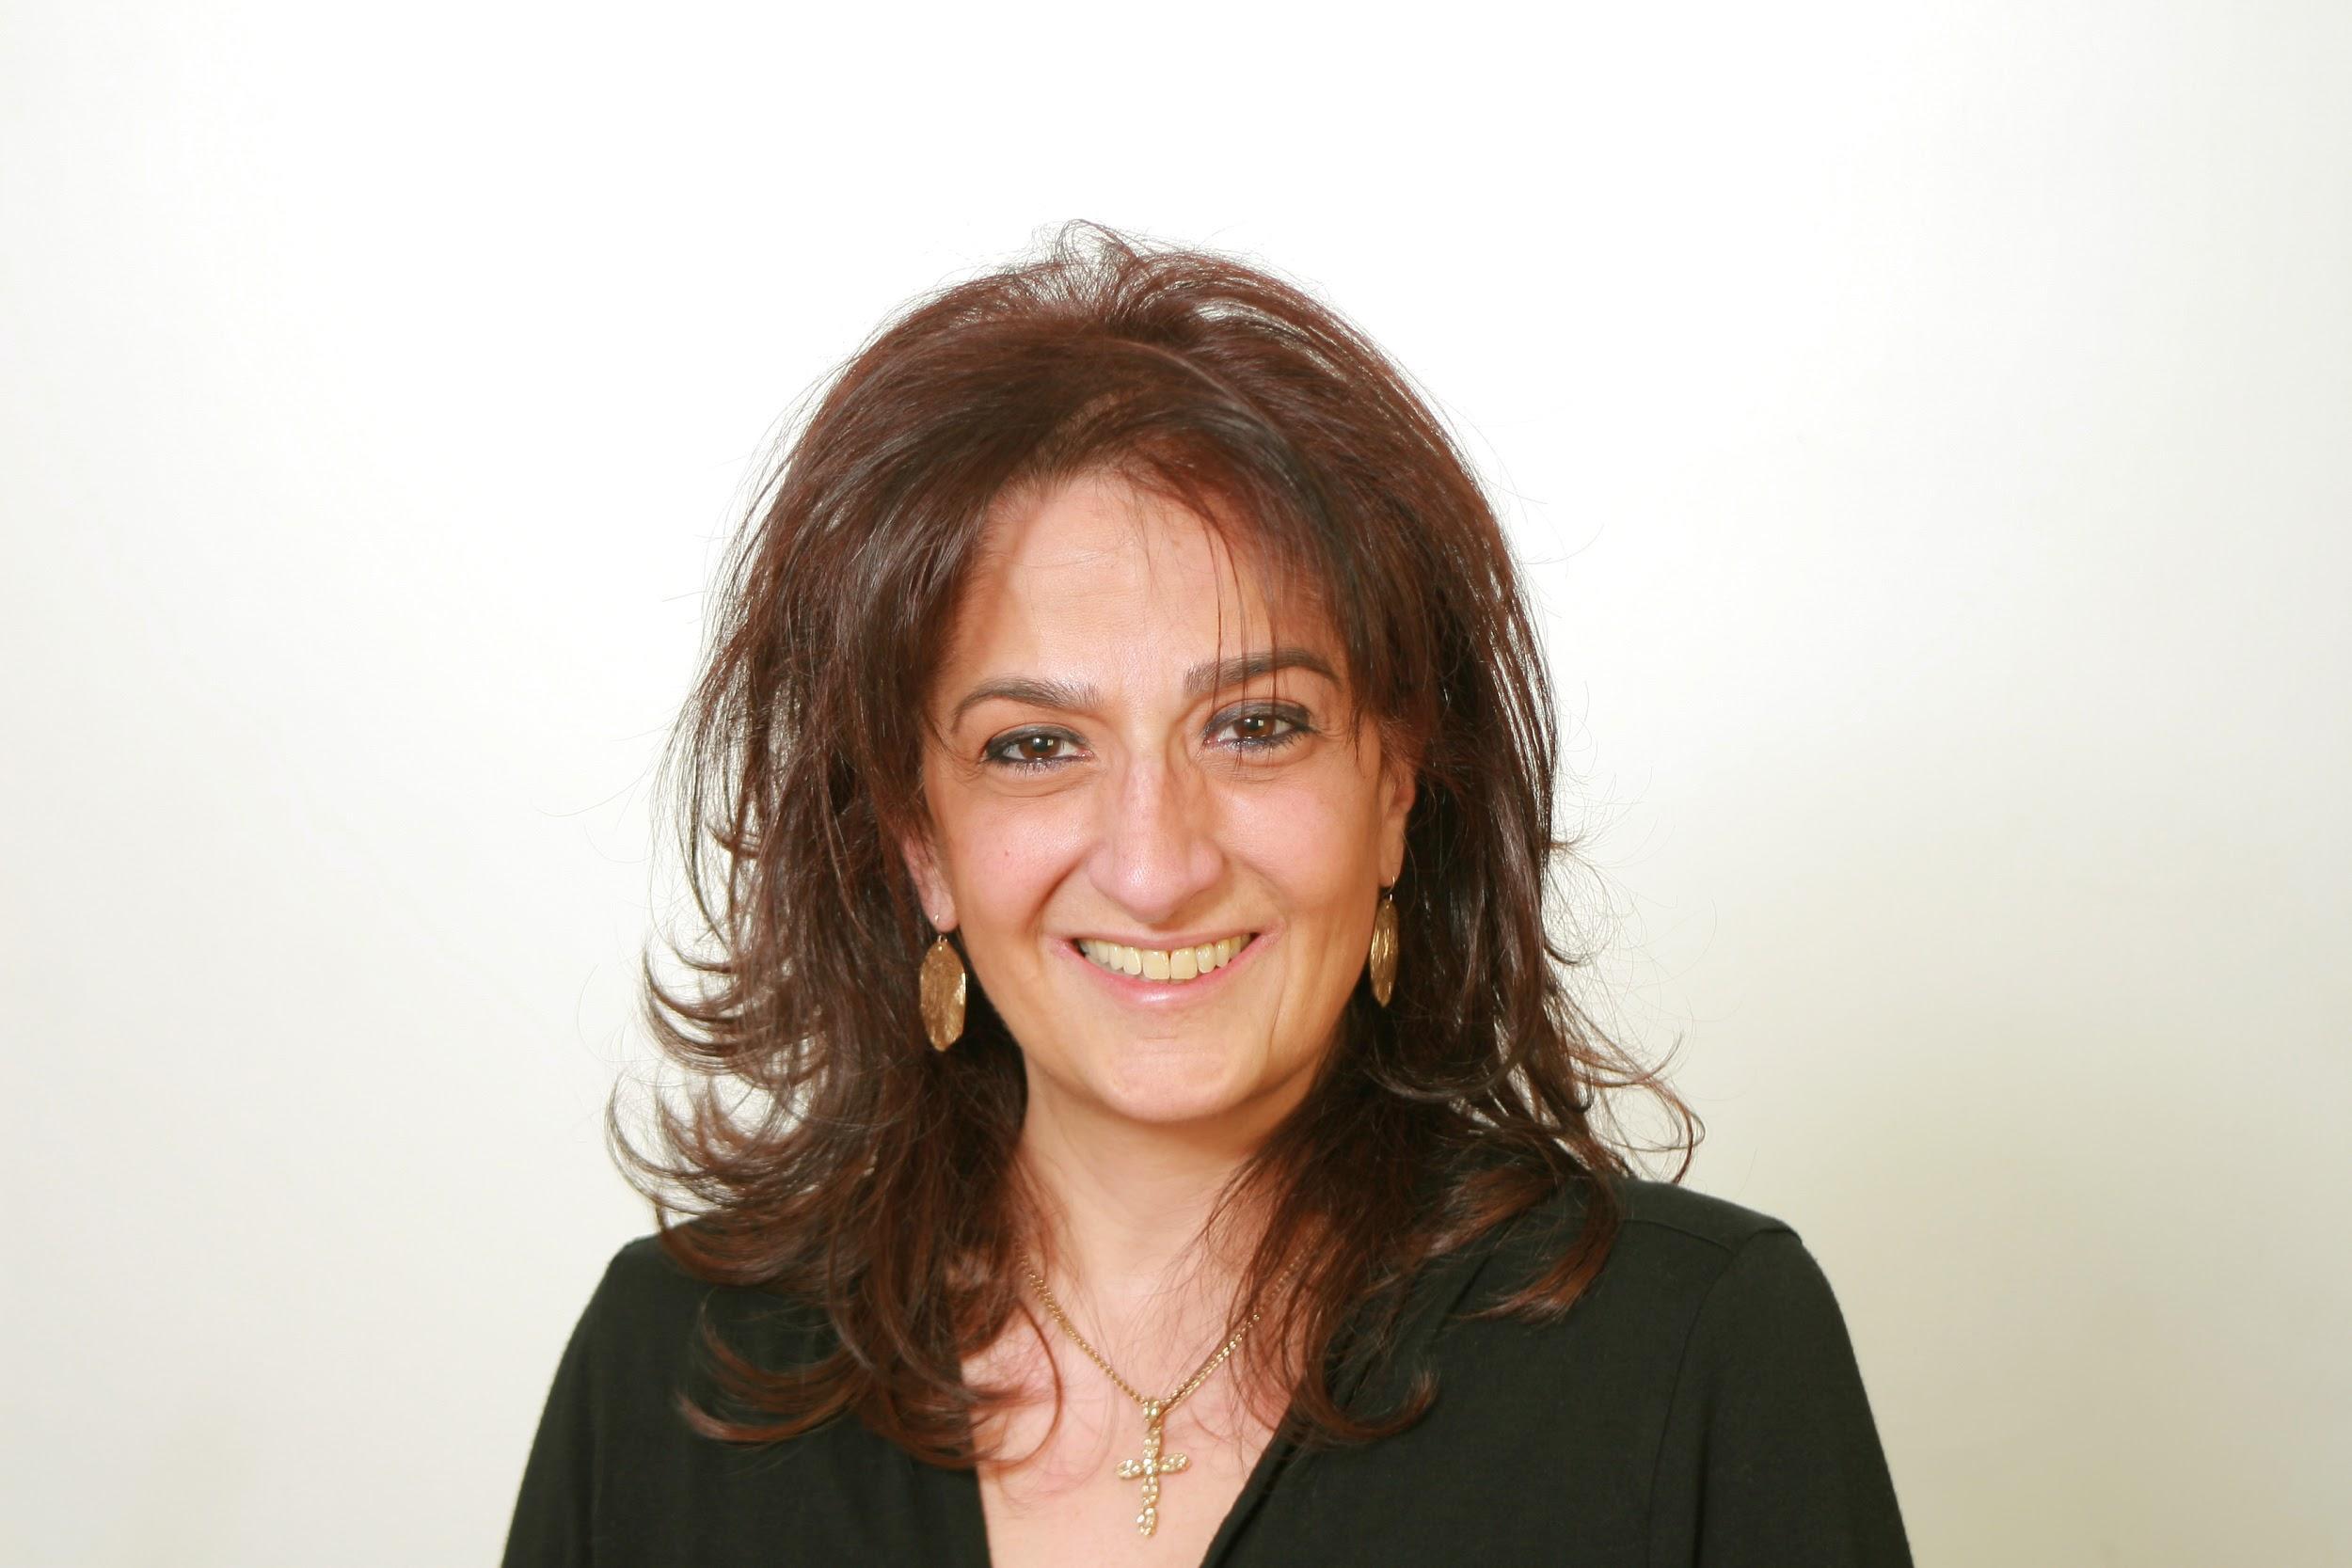 Arpi Vartanian, Regional Director of the Assembly